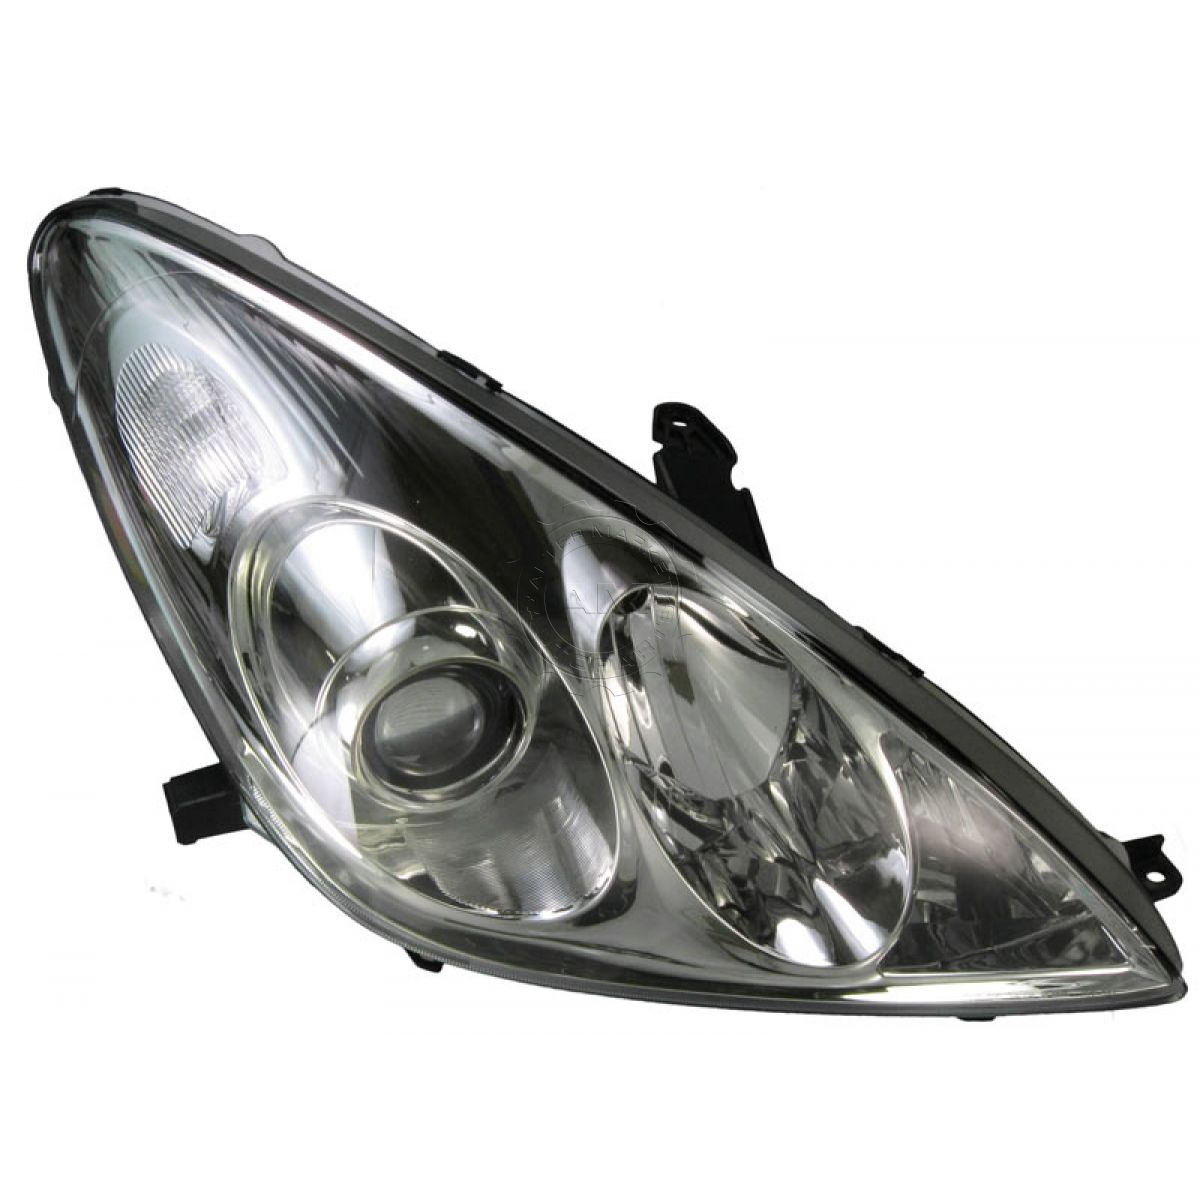 Hid Xenon Headlight Headlamp Passenger Side Right Rh New